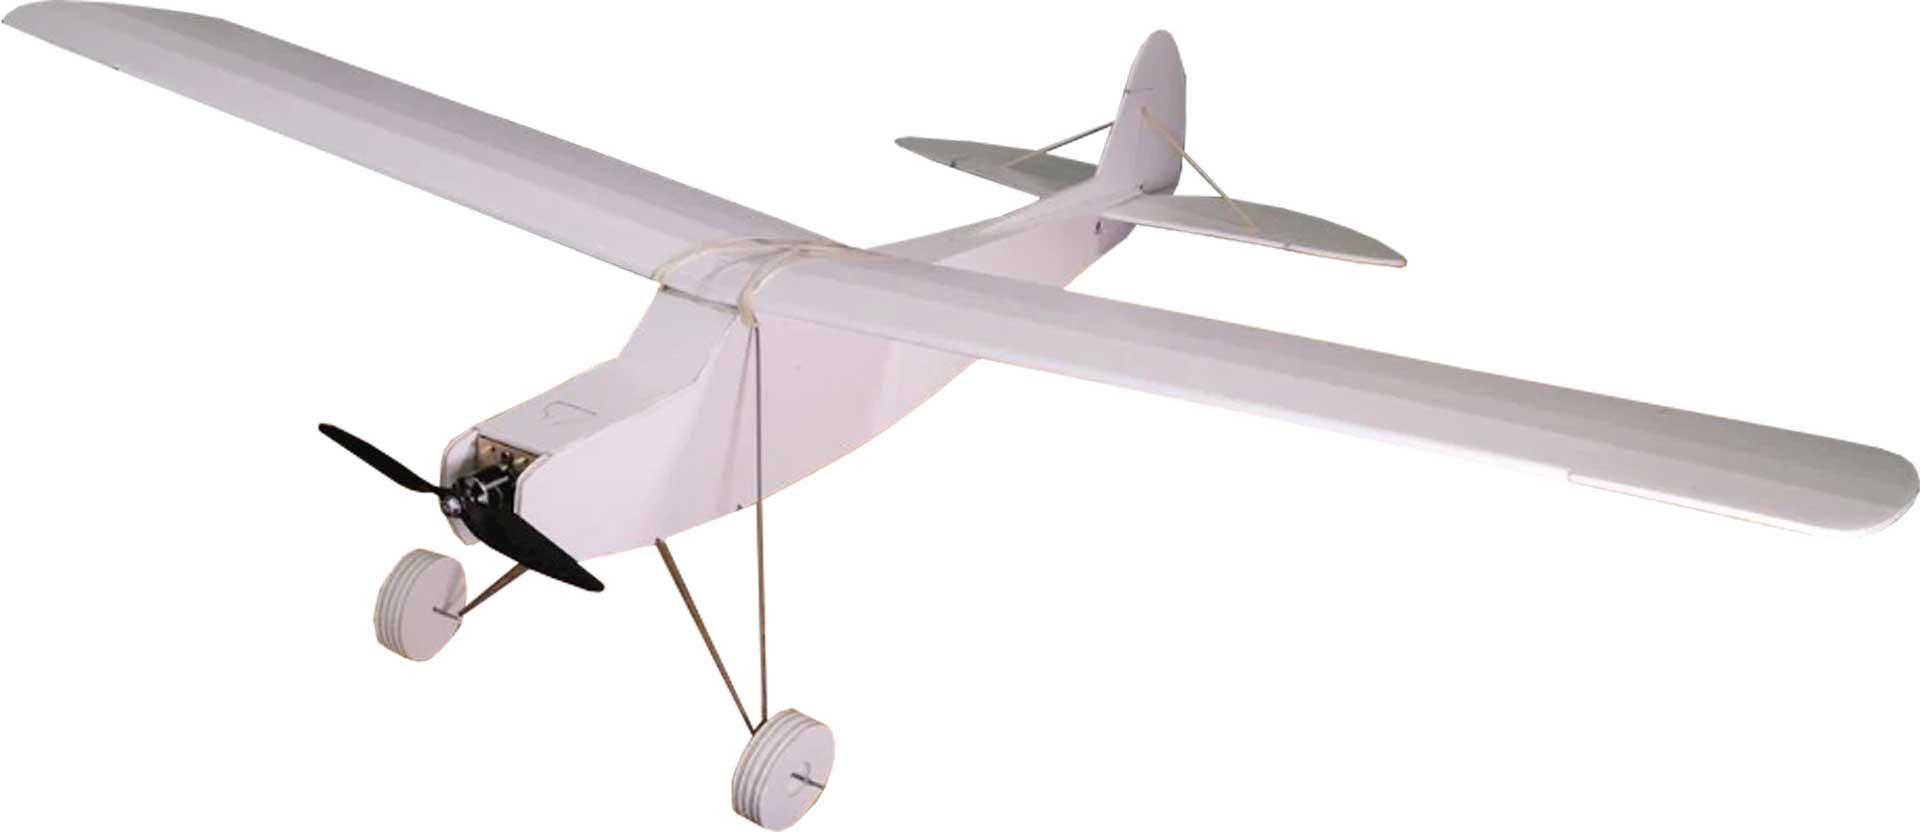 FLITE TEST Simple Storch Speed Built Kit Maker Foam 1460mm